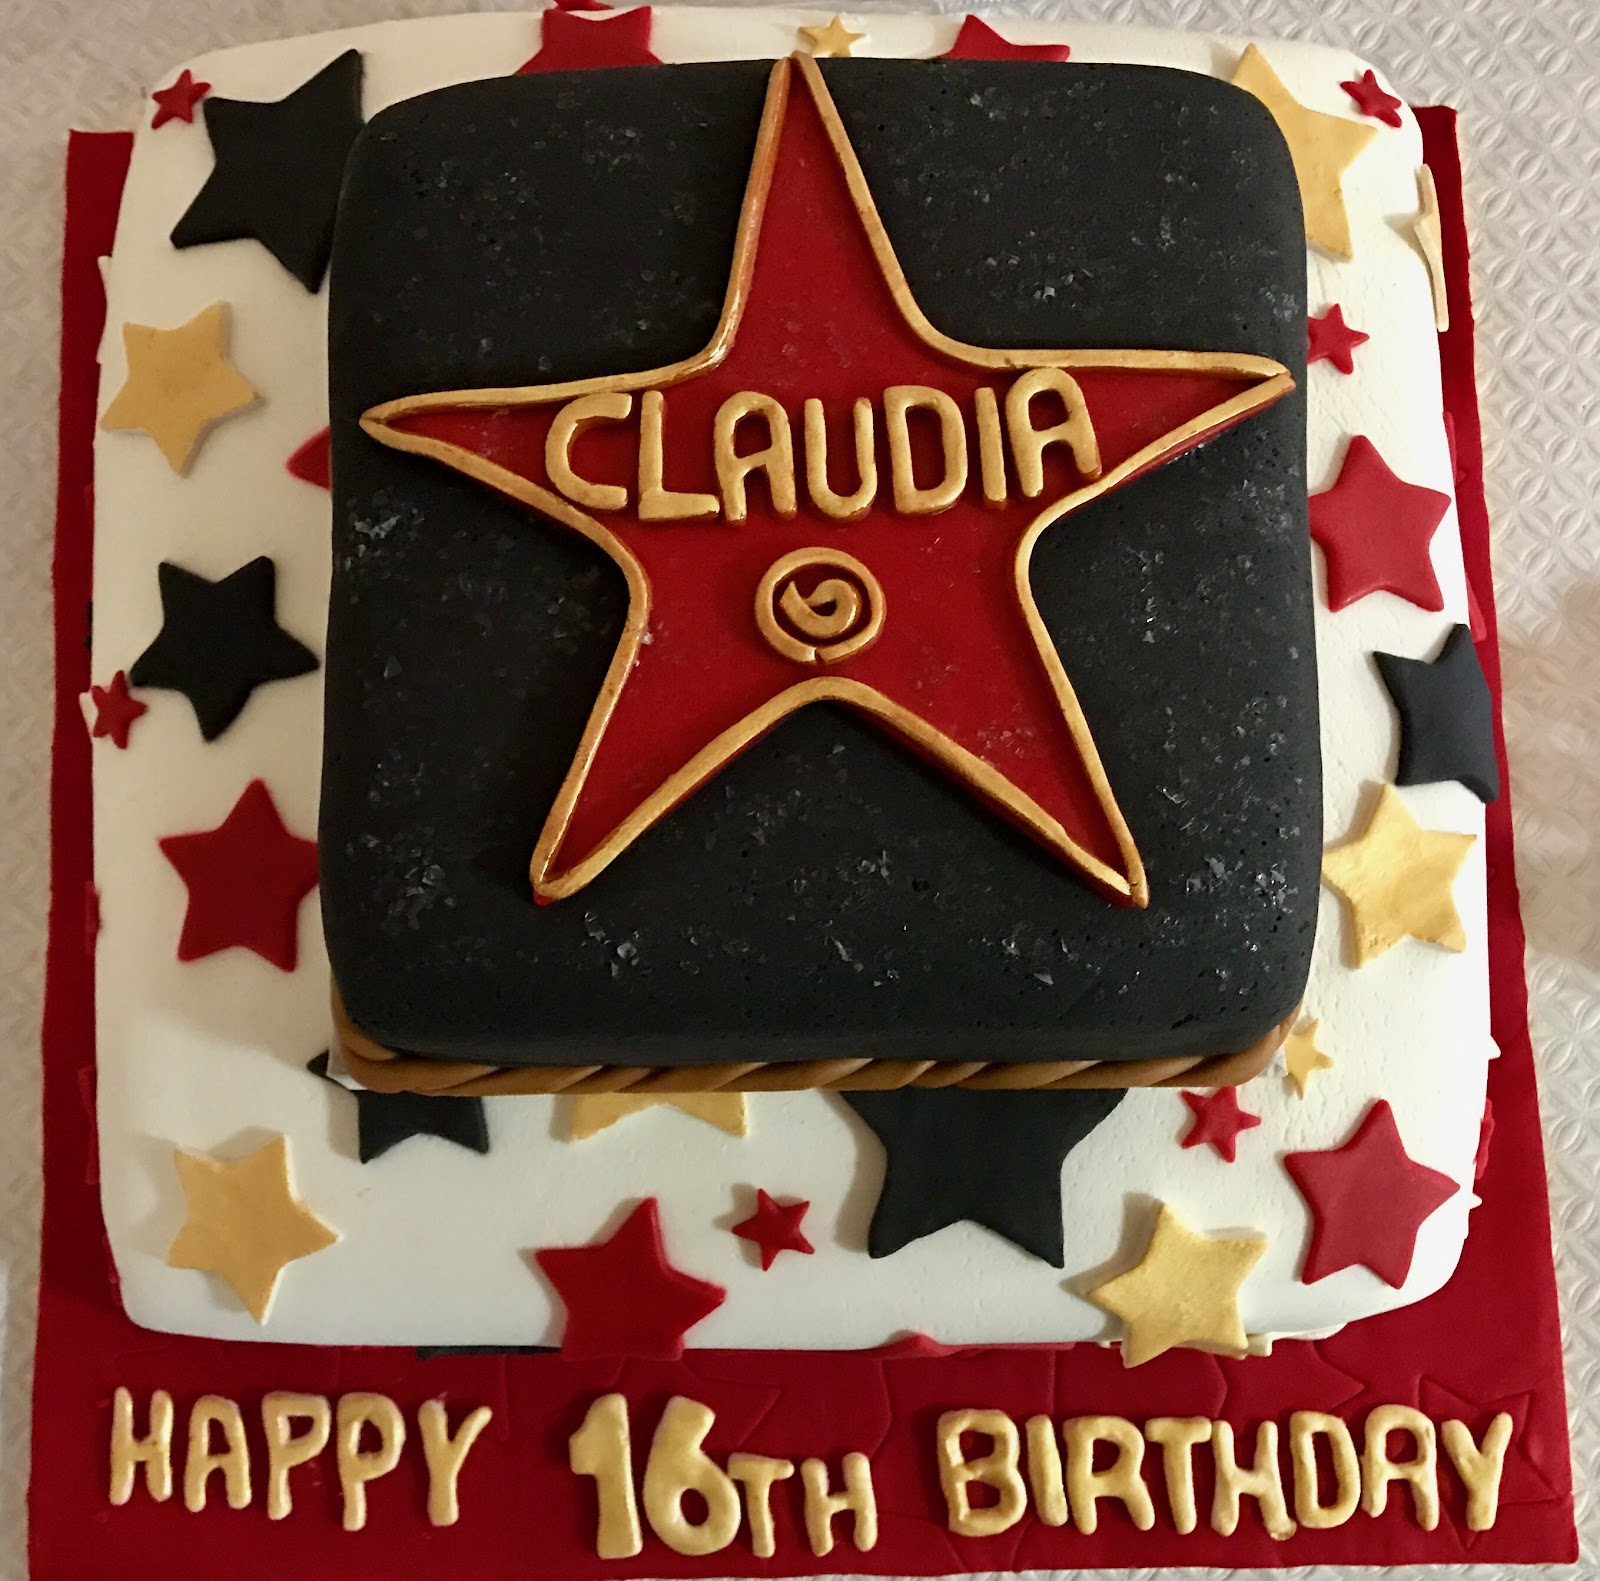 22nd Birthday Ideas In November: Cake Creations: Claudia's 16th Birthday ��, 22nd February 2017